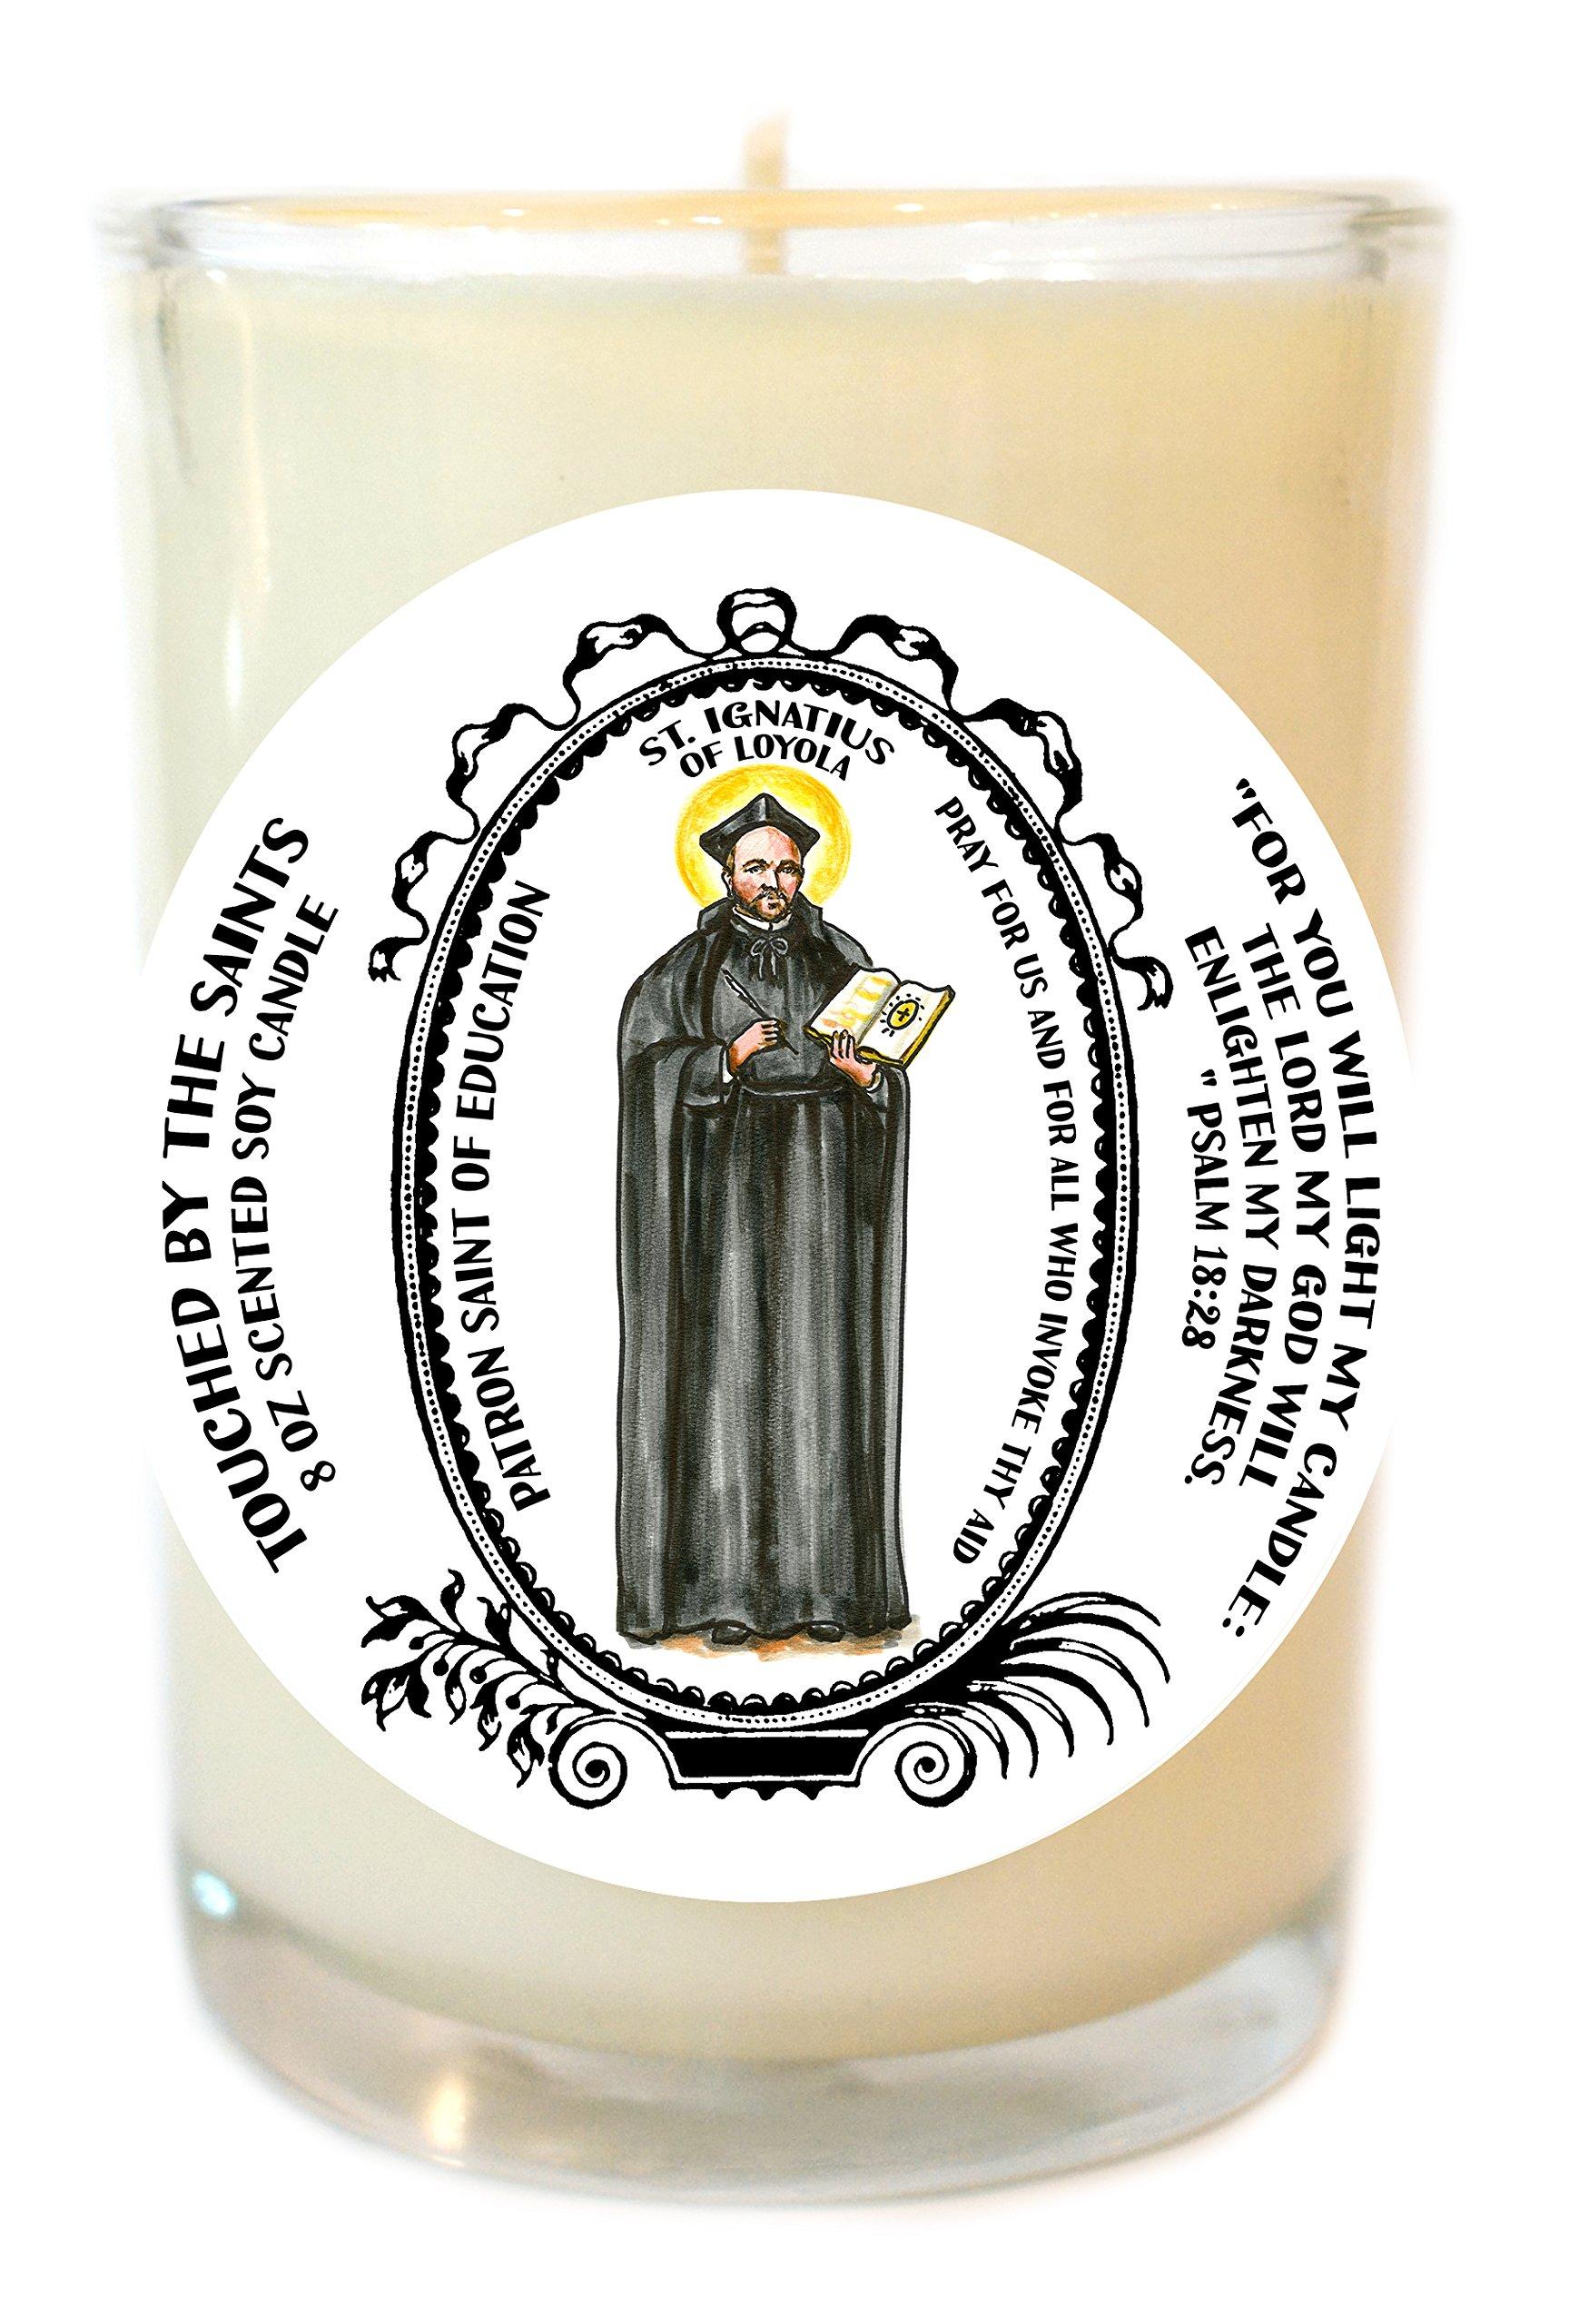 Saint Ignatius of Loyola Patron of Education 8 Oz Scented Soy Prayer Candle